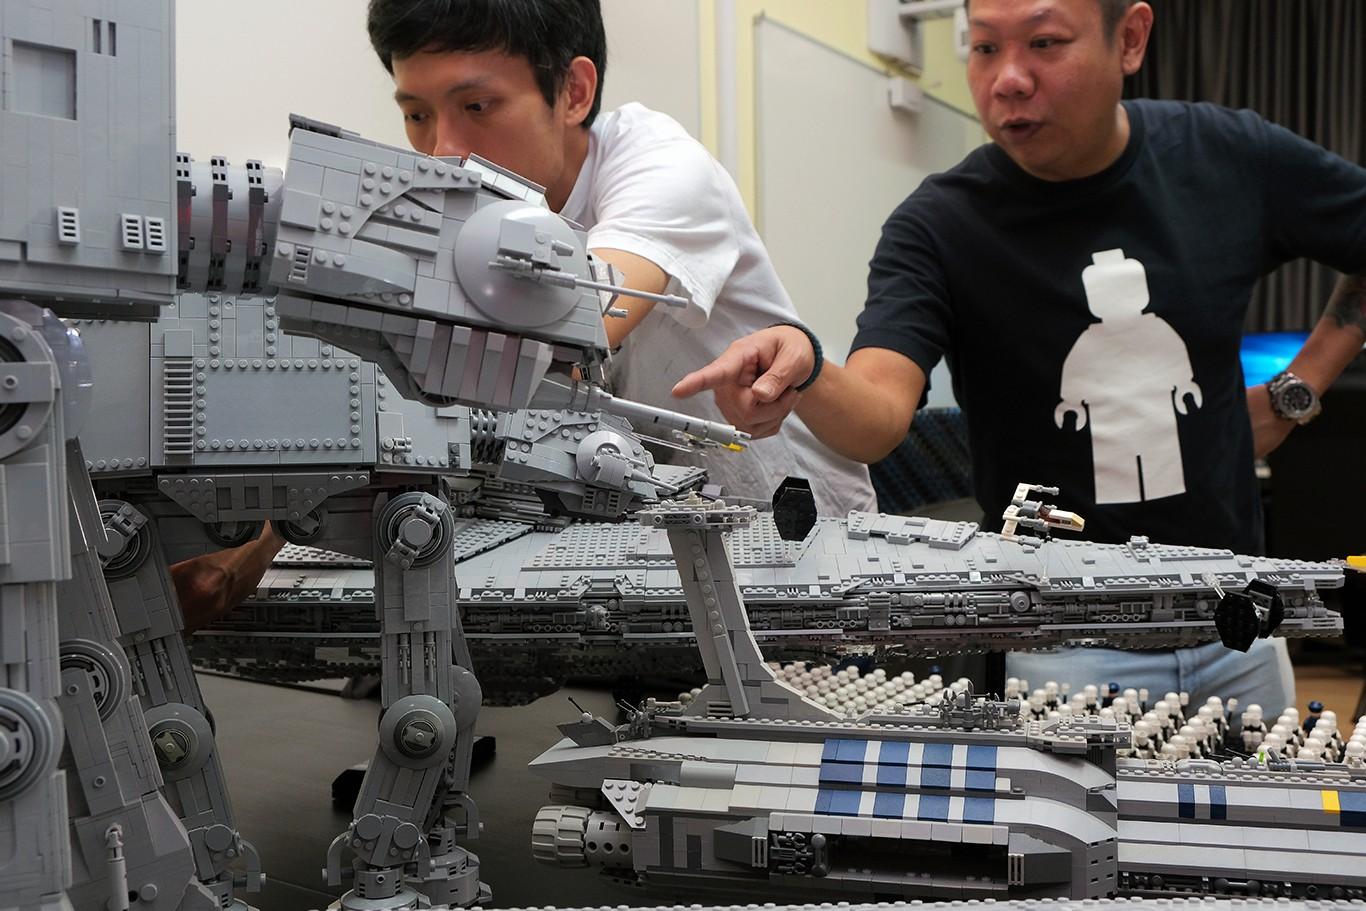 Tireless Stormtrooper Building Blocks Star War Darth Vader Lord Anakin Skywalker With Weapon Sword Gun Anime Toy Toys & Hobbies